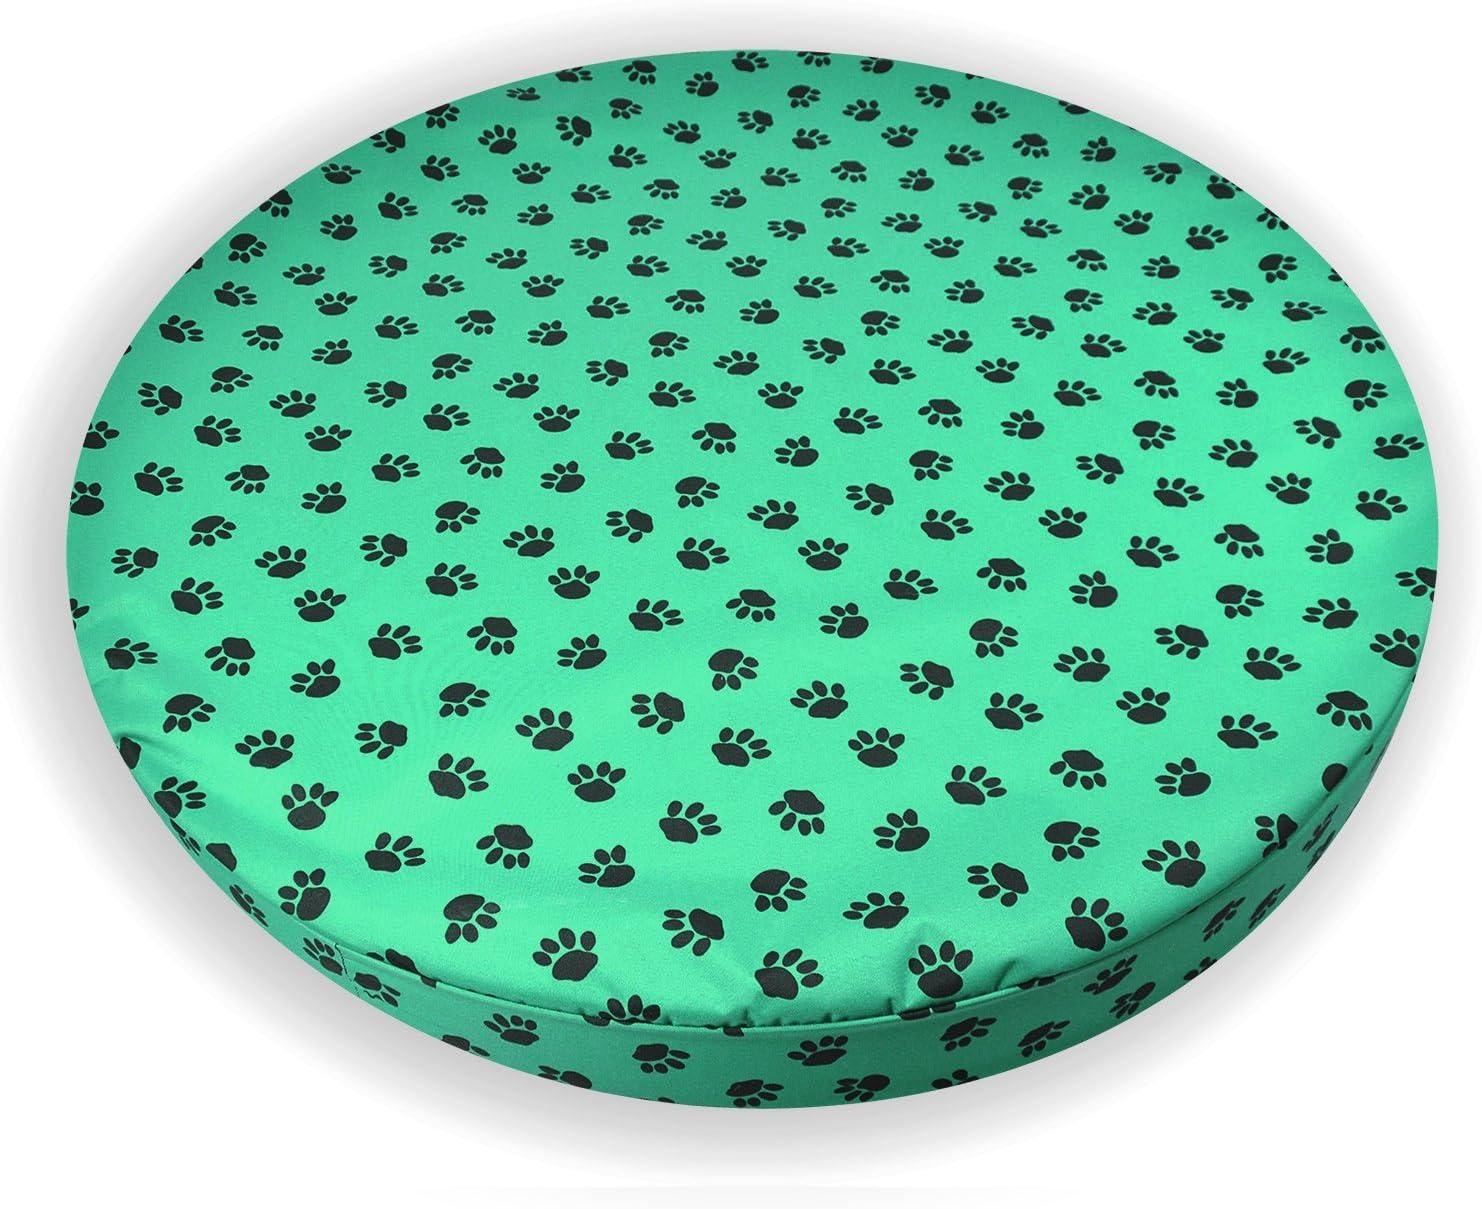 Paws - Pet Beds Direct Verde Patas–ortopédica de Espuma con Efecto Memoria para Perro Impermeable Cama